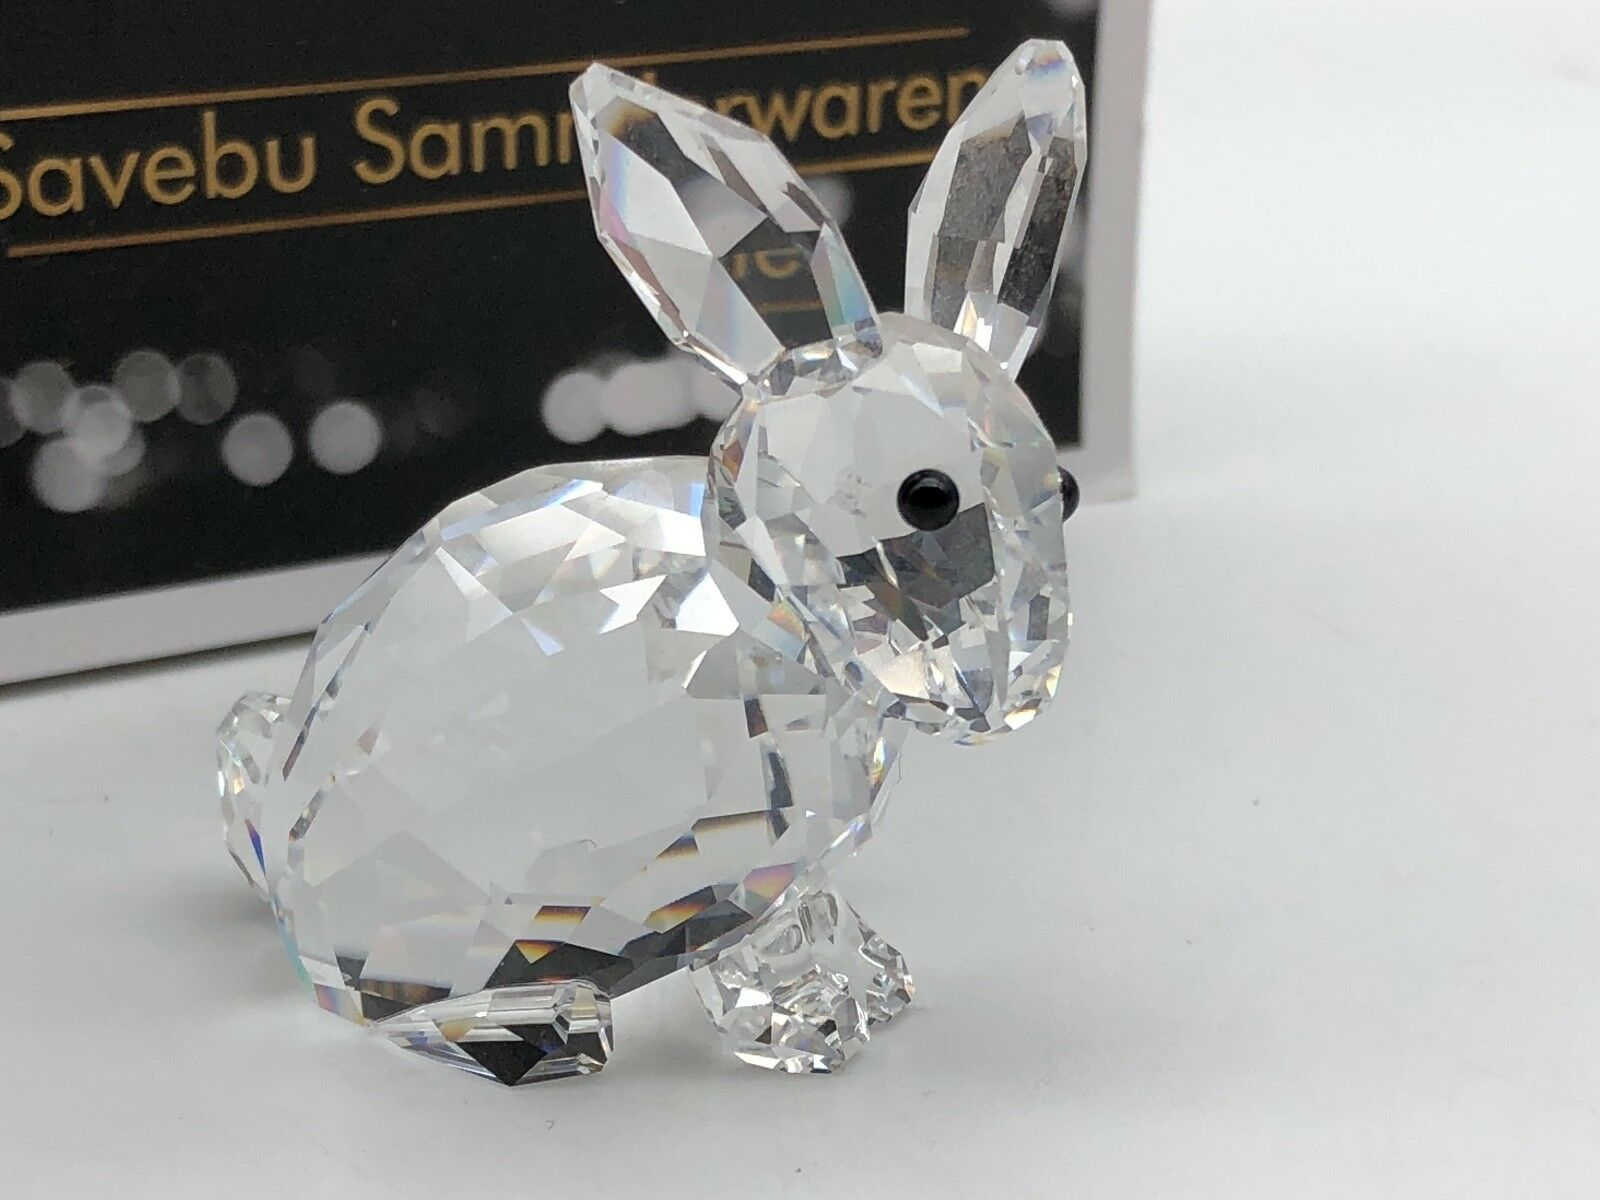 Swarovski Figurine 905777 Lapin Assis Cm 4 5 Cm Assis Excellent Etat